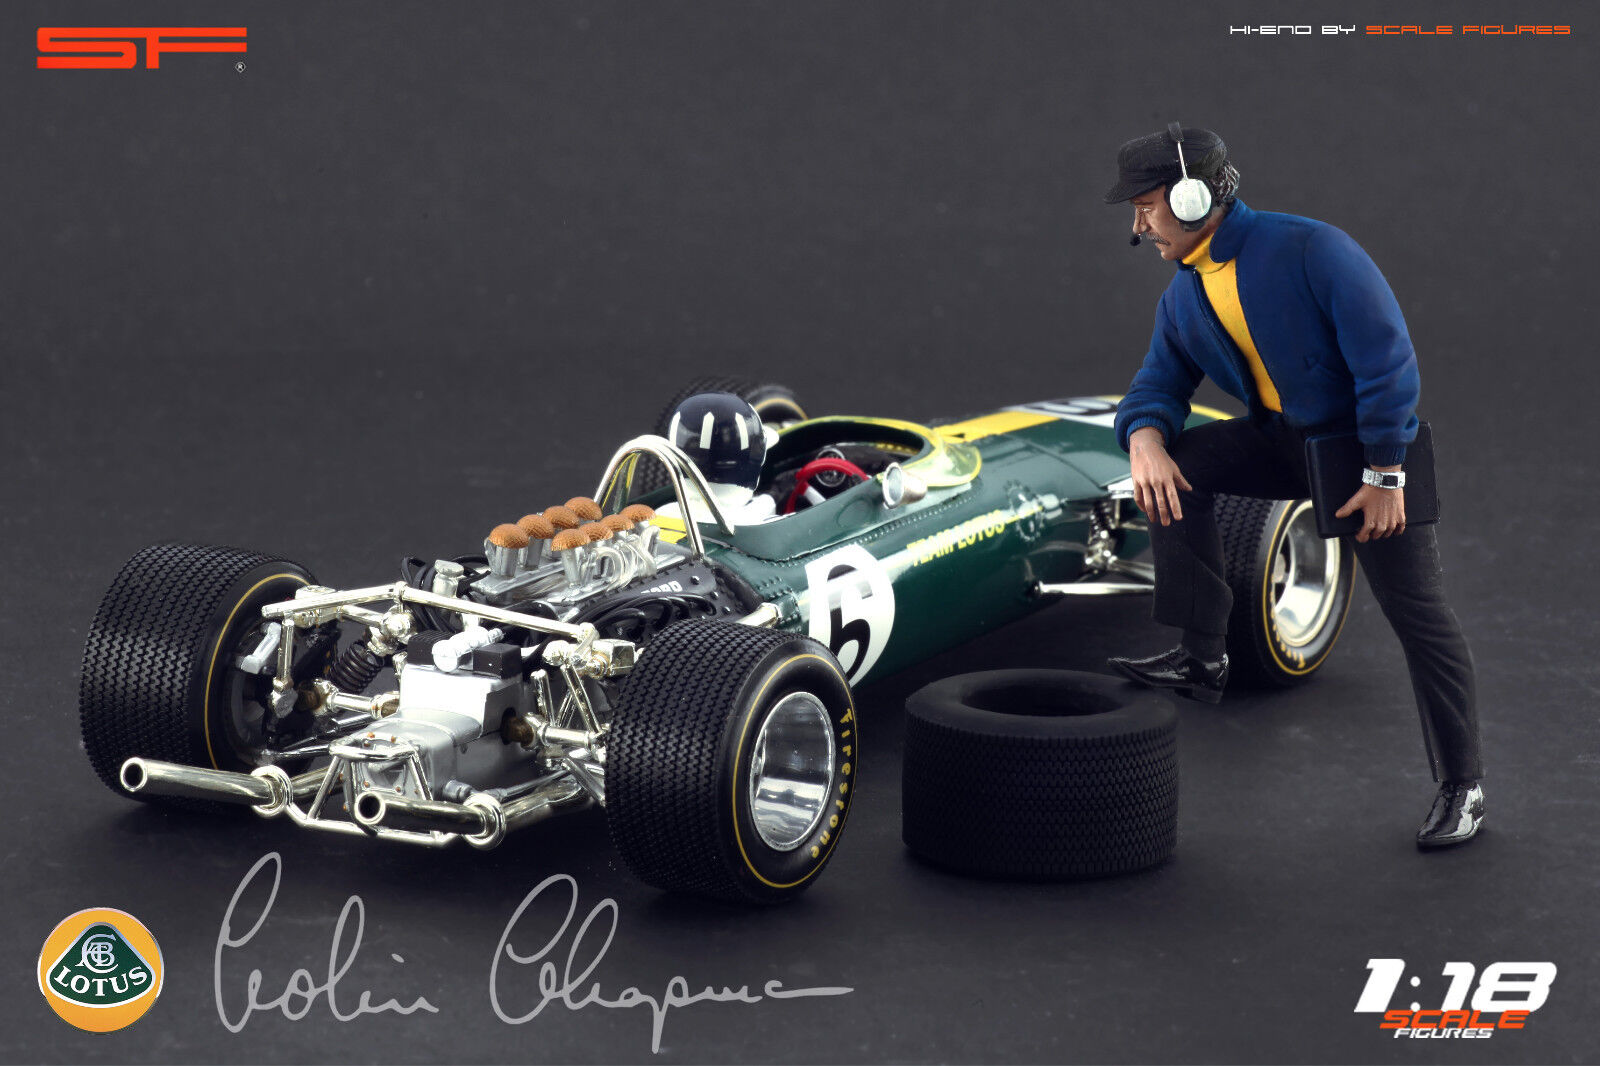 1/18 1/18 1/18 Colin Chapman Muy Raro CMC AutoArt Minichamps cifras para 0dfa33